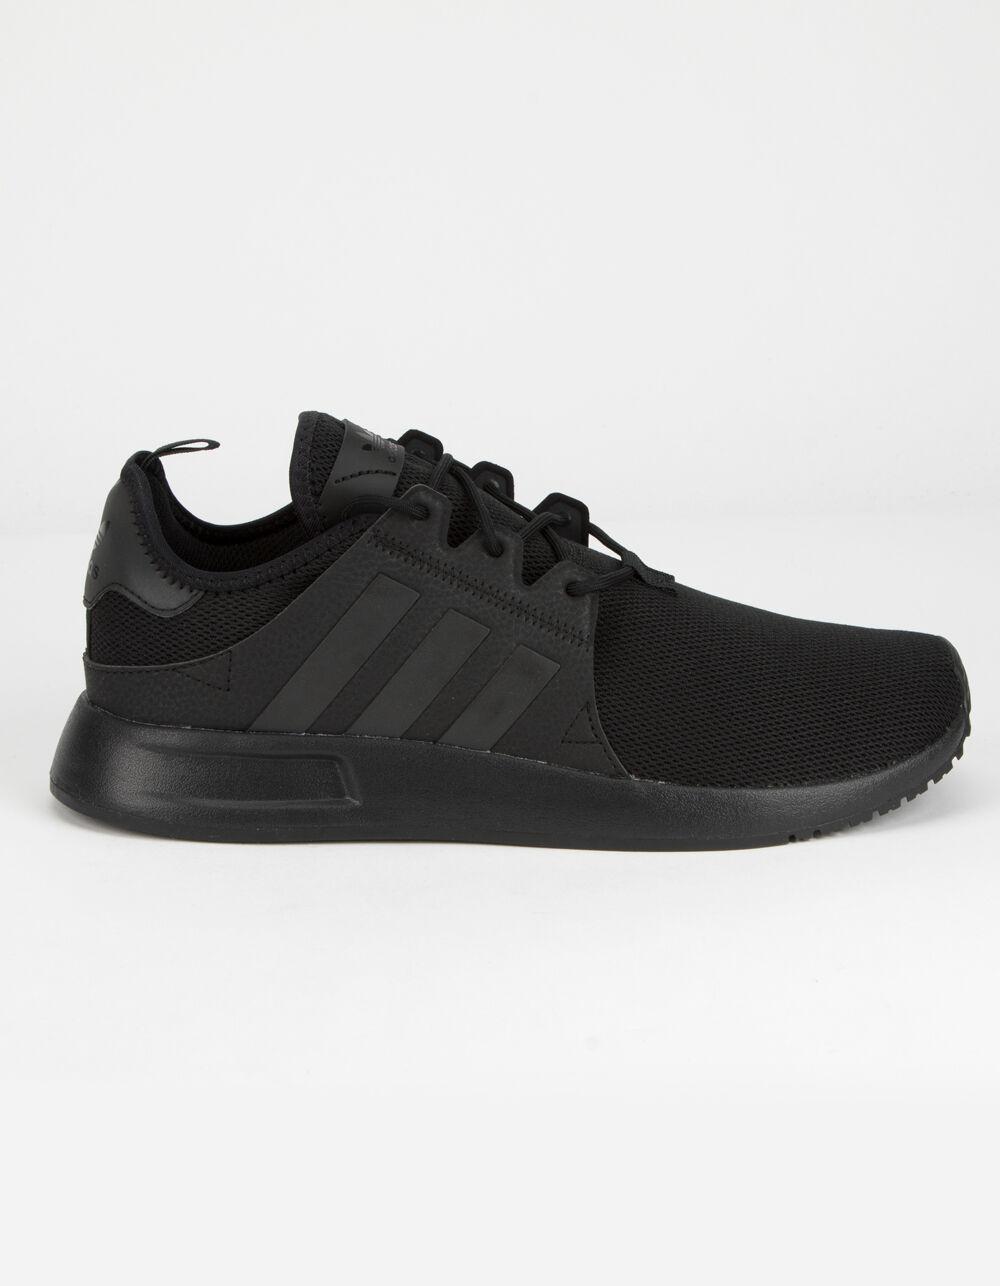 ADIDAS X_PLR Core Black Shoes